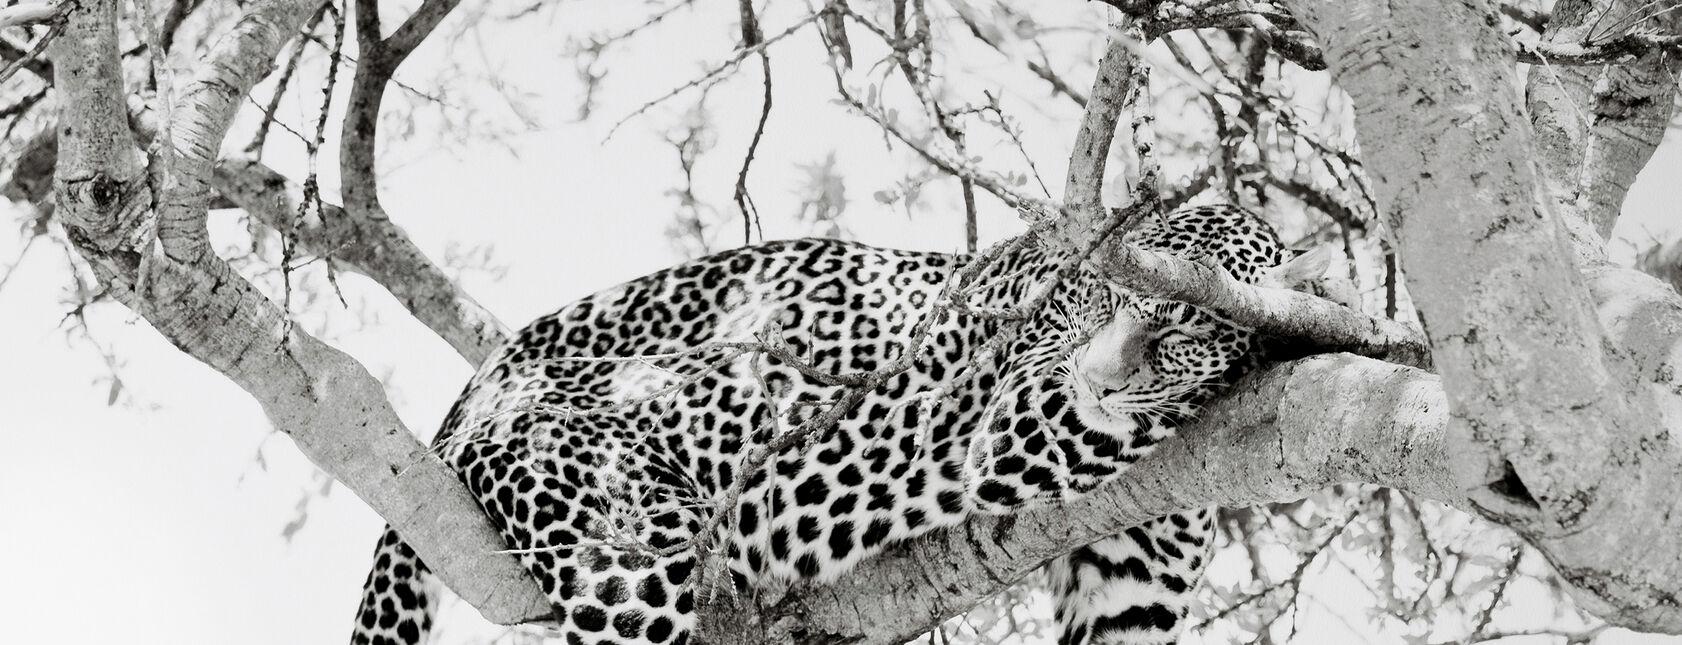 Lejon & stora Kattdjur